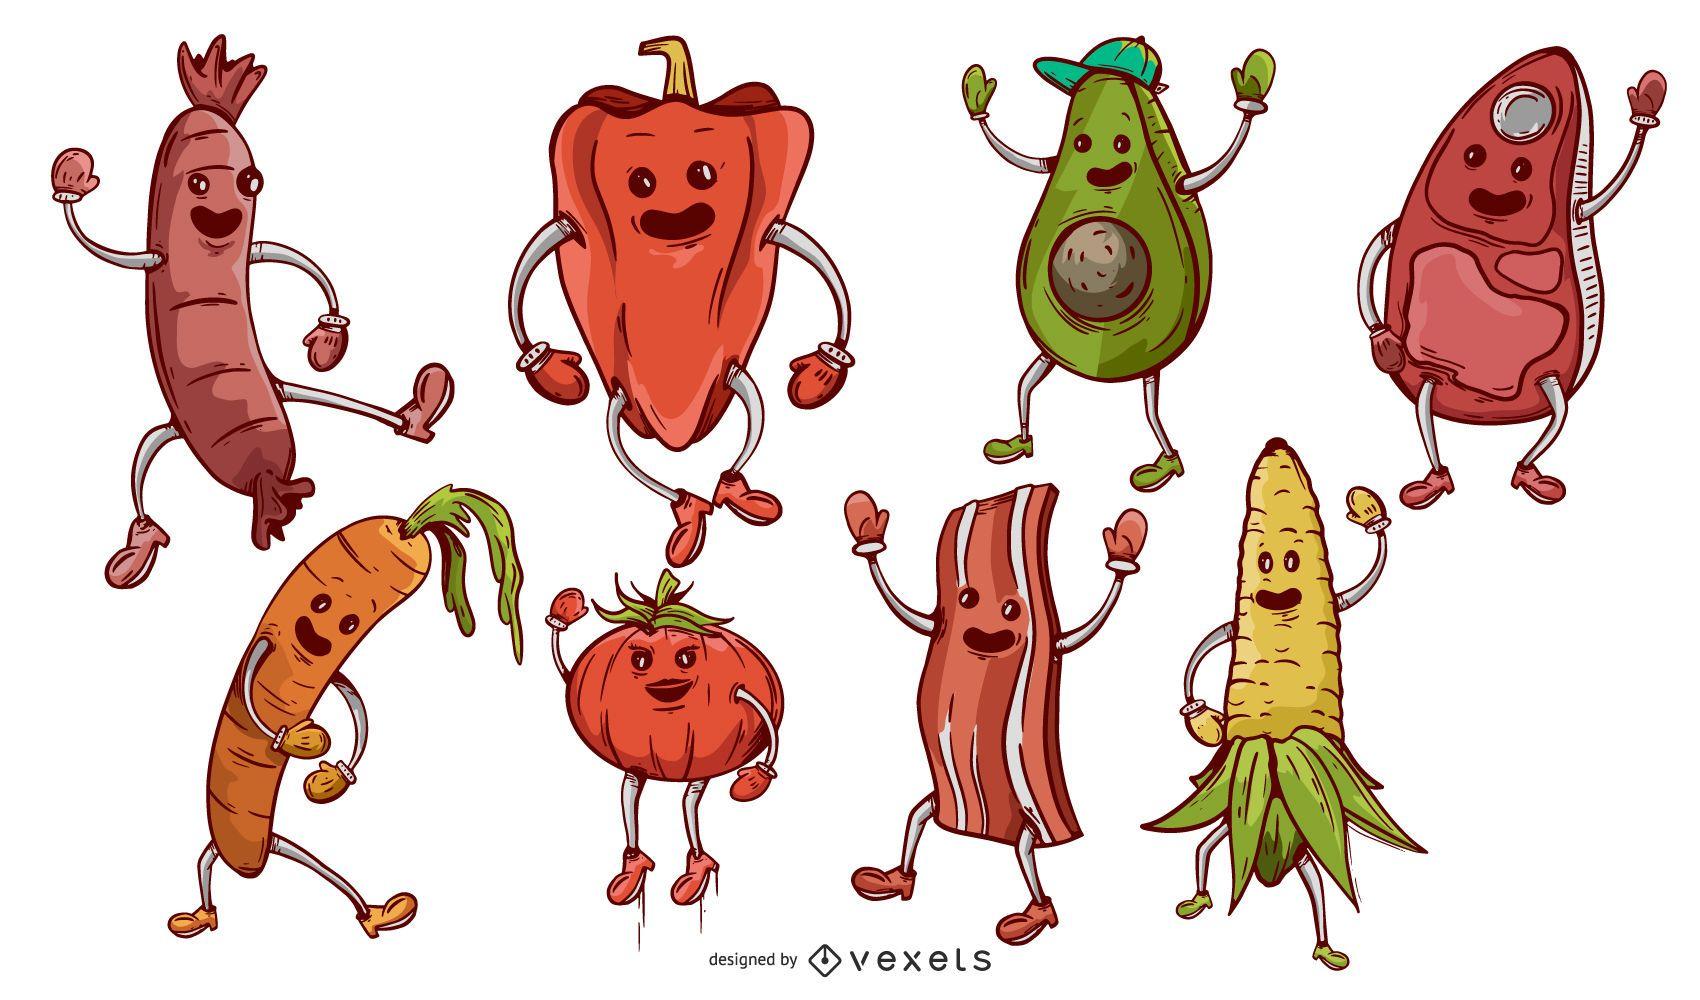 Dibujos animados de comida de barbacoa Elemetns